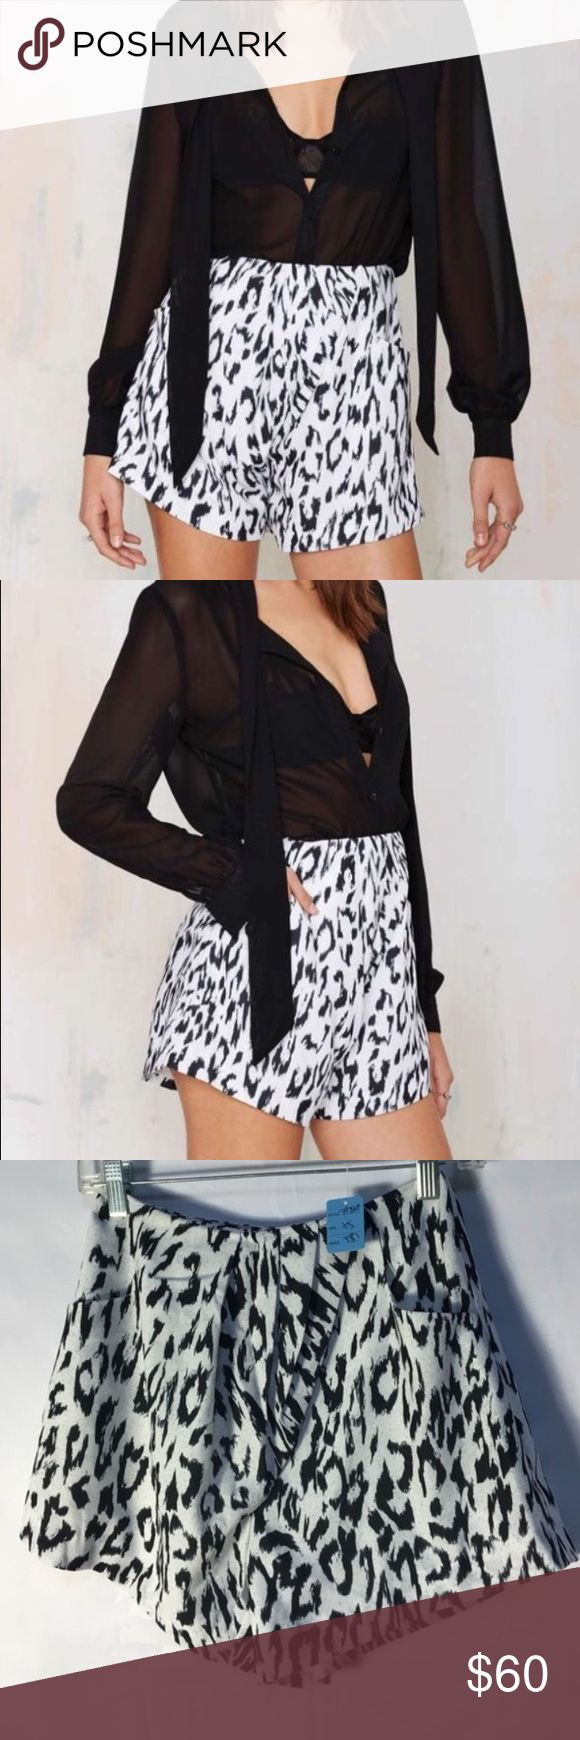 Finders Keepers NWT leopard shorts - XS Finders Keepers - NWT - white leopard shorts from Nasty Gal - high waist - XS - Tags: asos / nasty gal / tobi / Zara / clover canyon / Parker / bcbgeneration / bcbg / minkpink / nbd / for love & lemons / ASOS Shorts